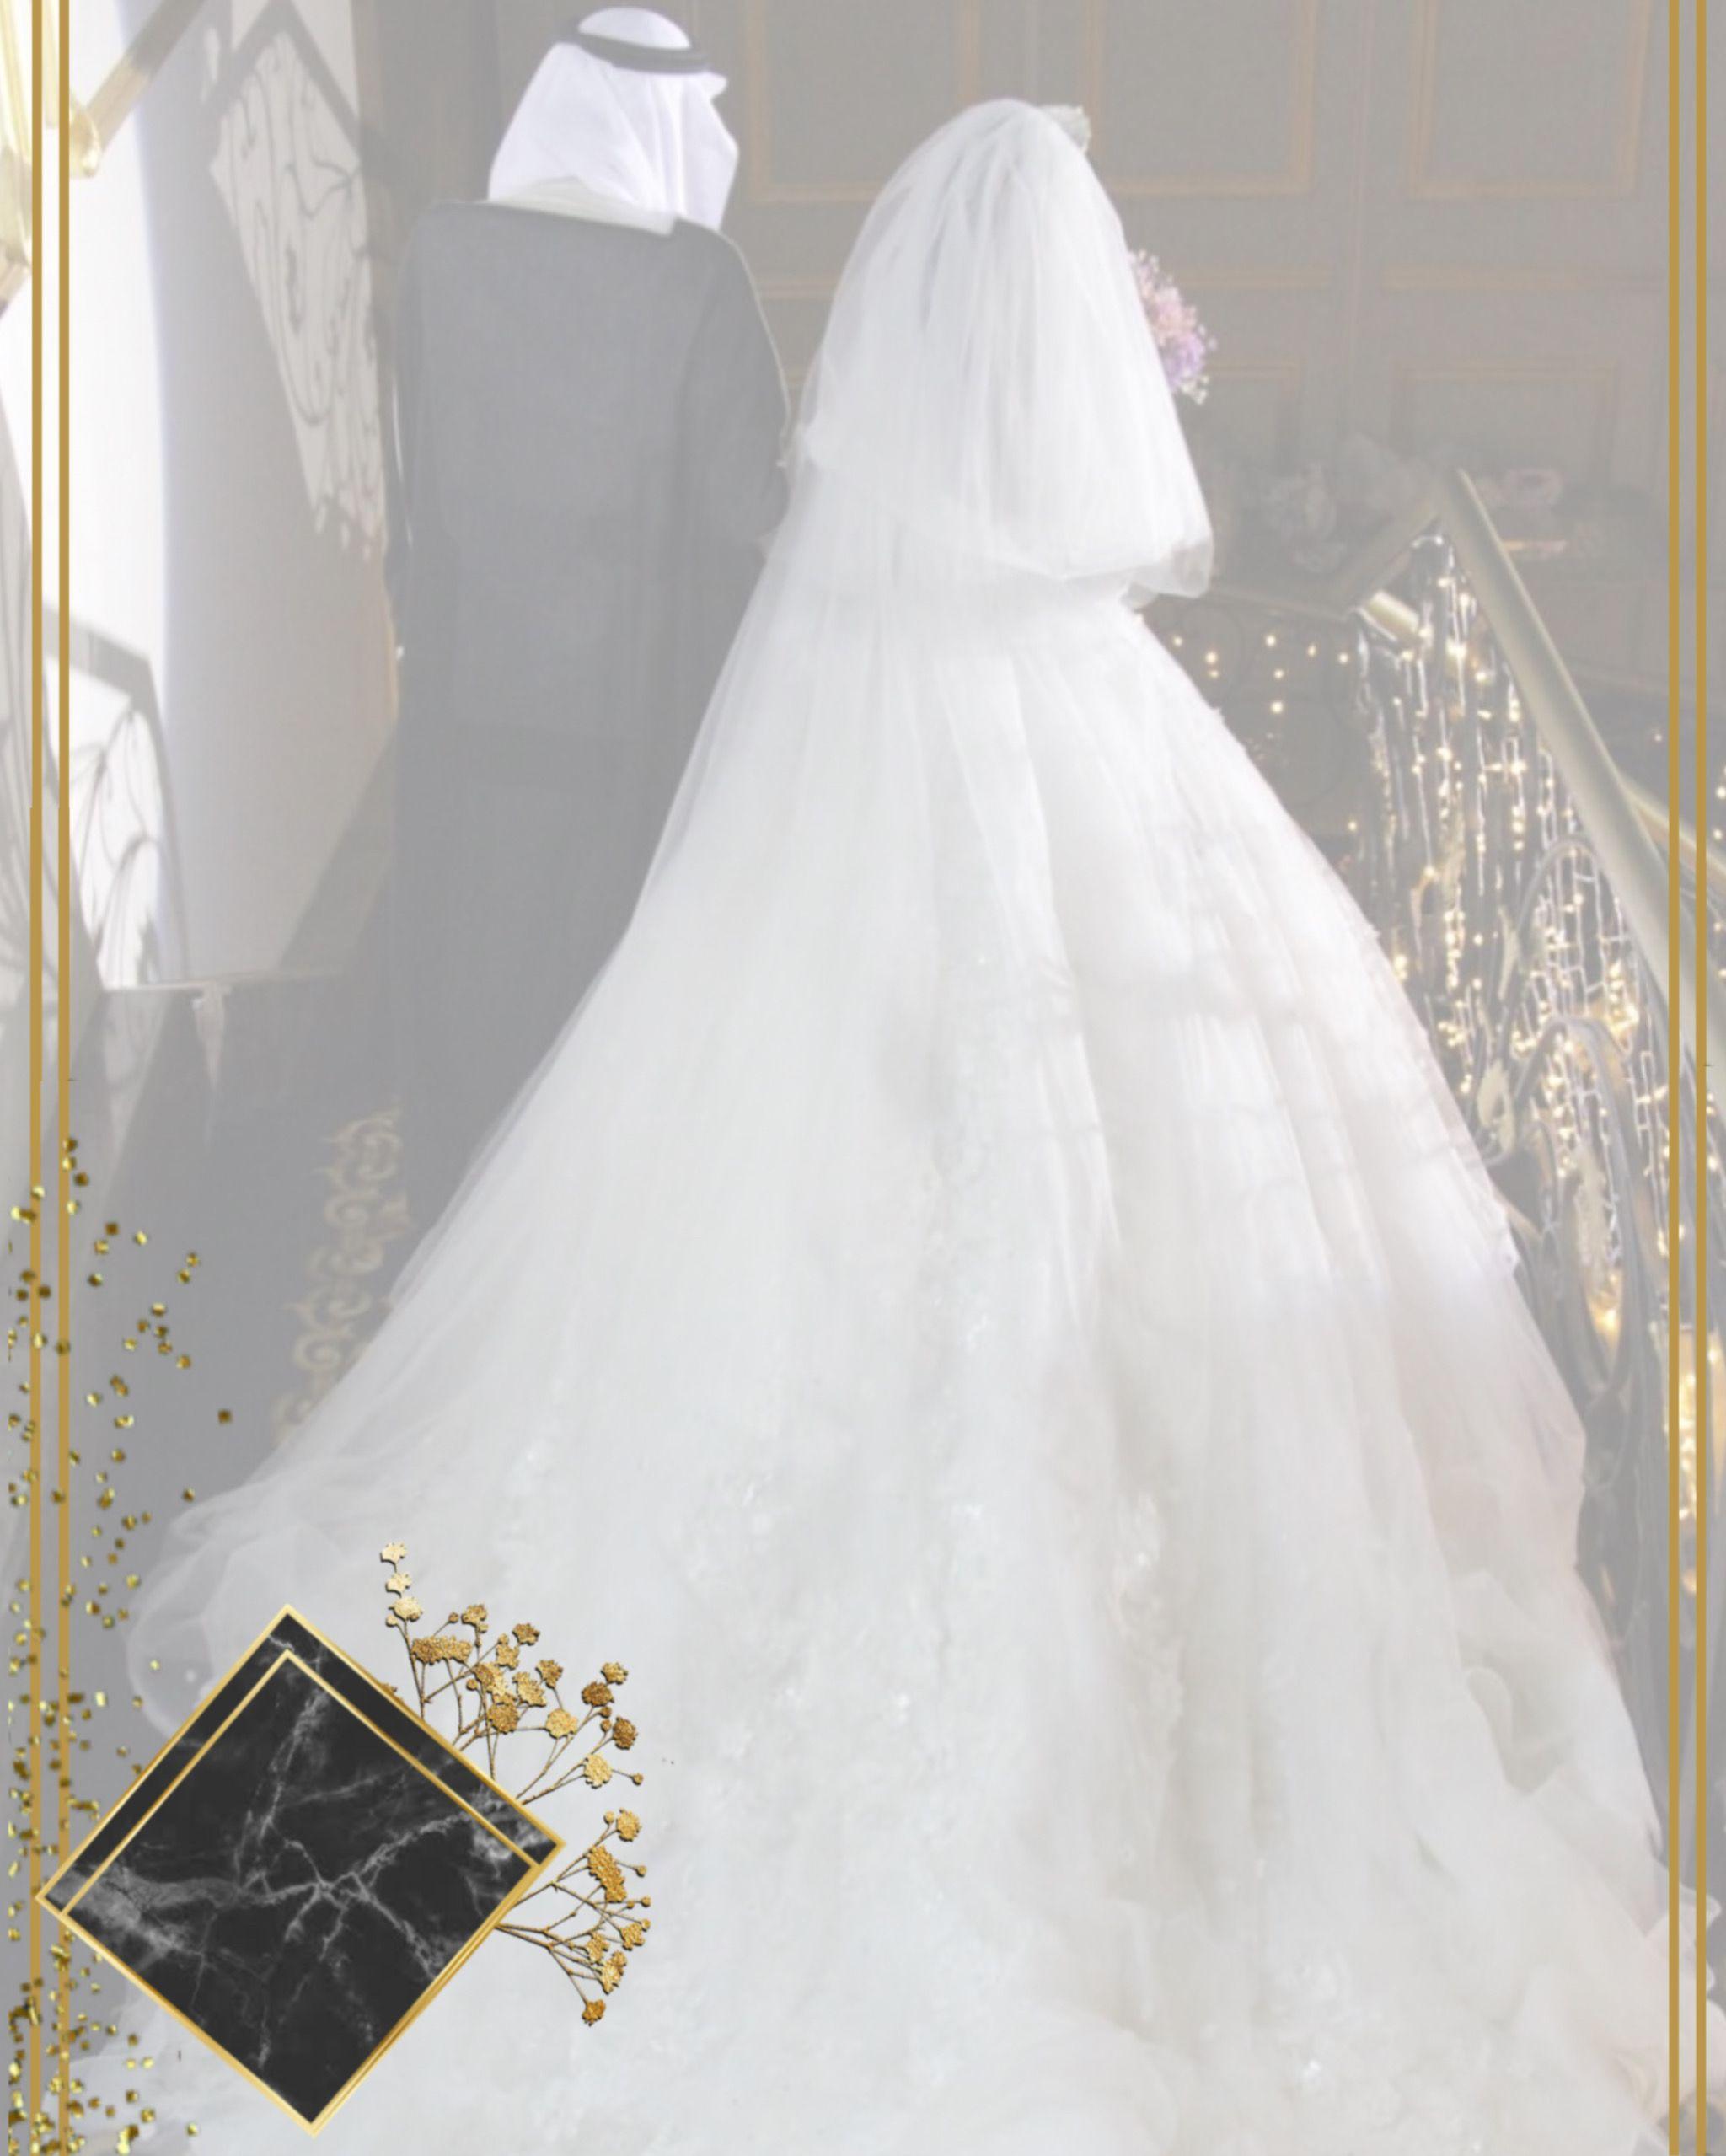 زفاف دعوة زفاف دعوة تصميم جاهز زواج فلتر عروس عريس Wedding Design Freetoedit Wedding Logo Design Flower Graphic Design Photo Collage Design